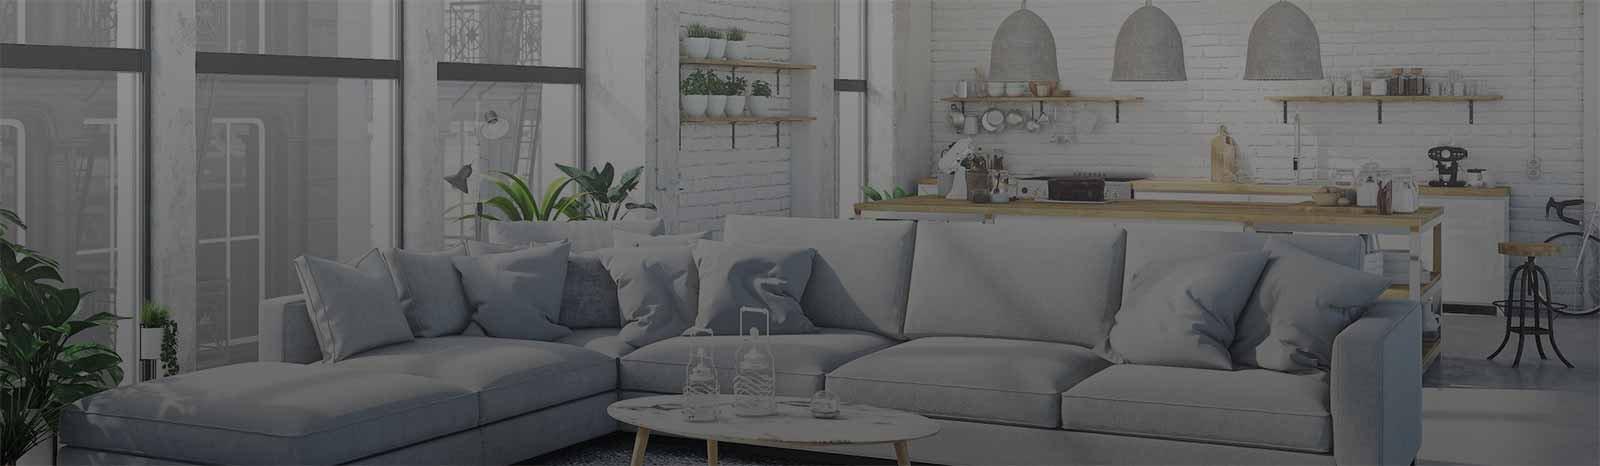 house Air Filtration Maintenance